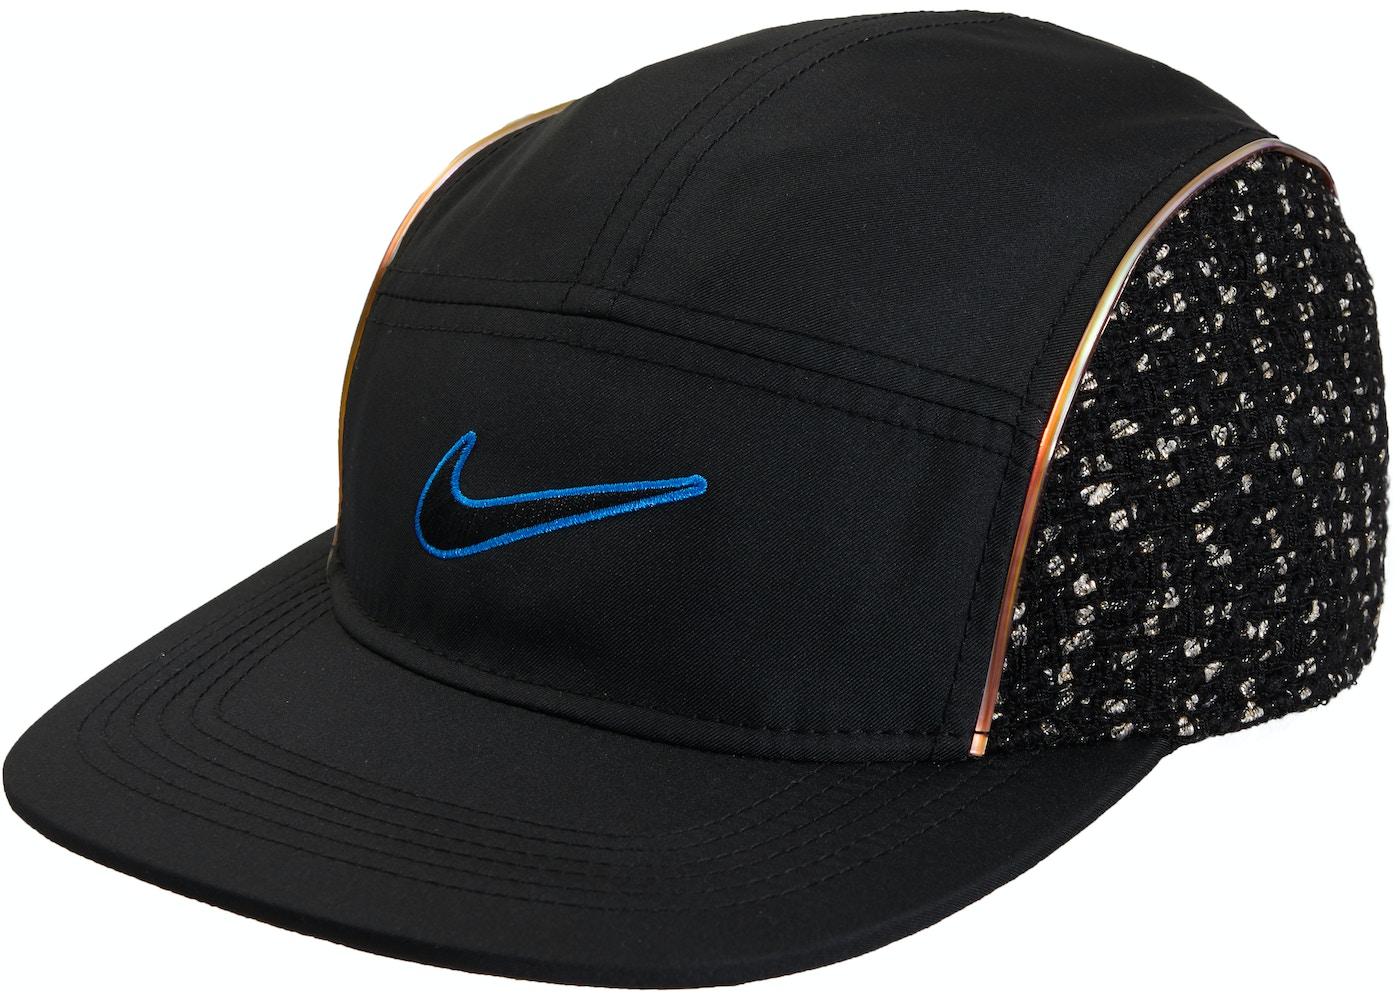 bcb990c1f8a Supreme Nike Boucle Running Hat Black. Nike Boucle Running